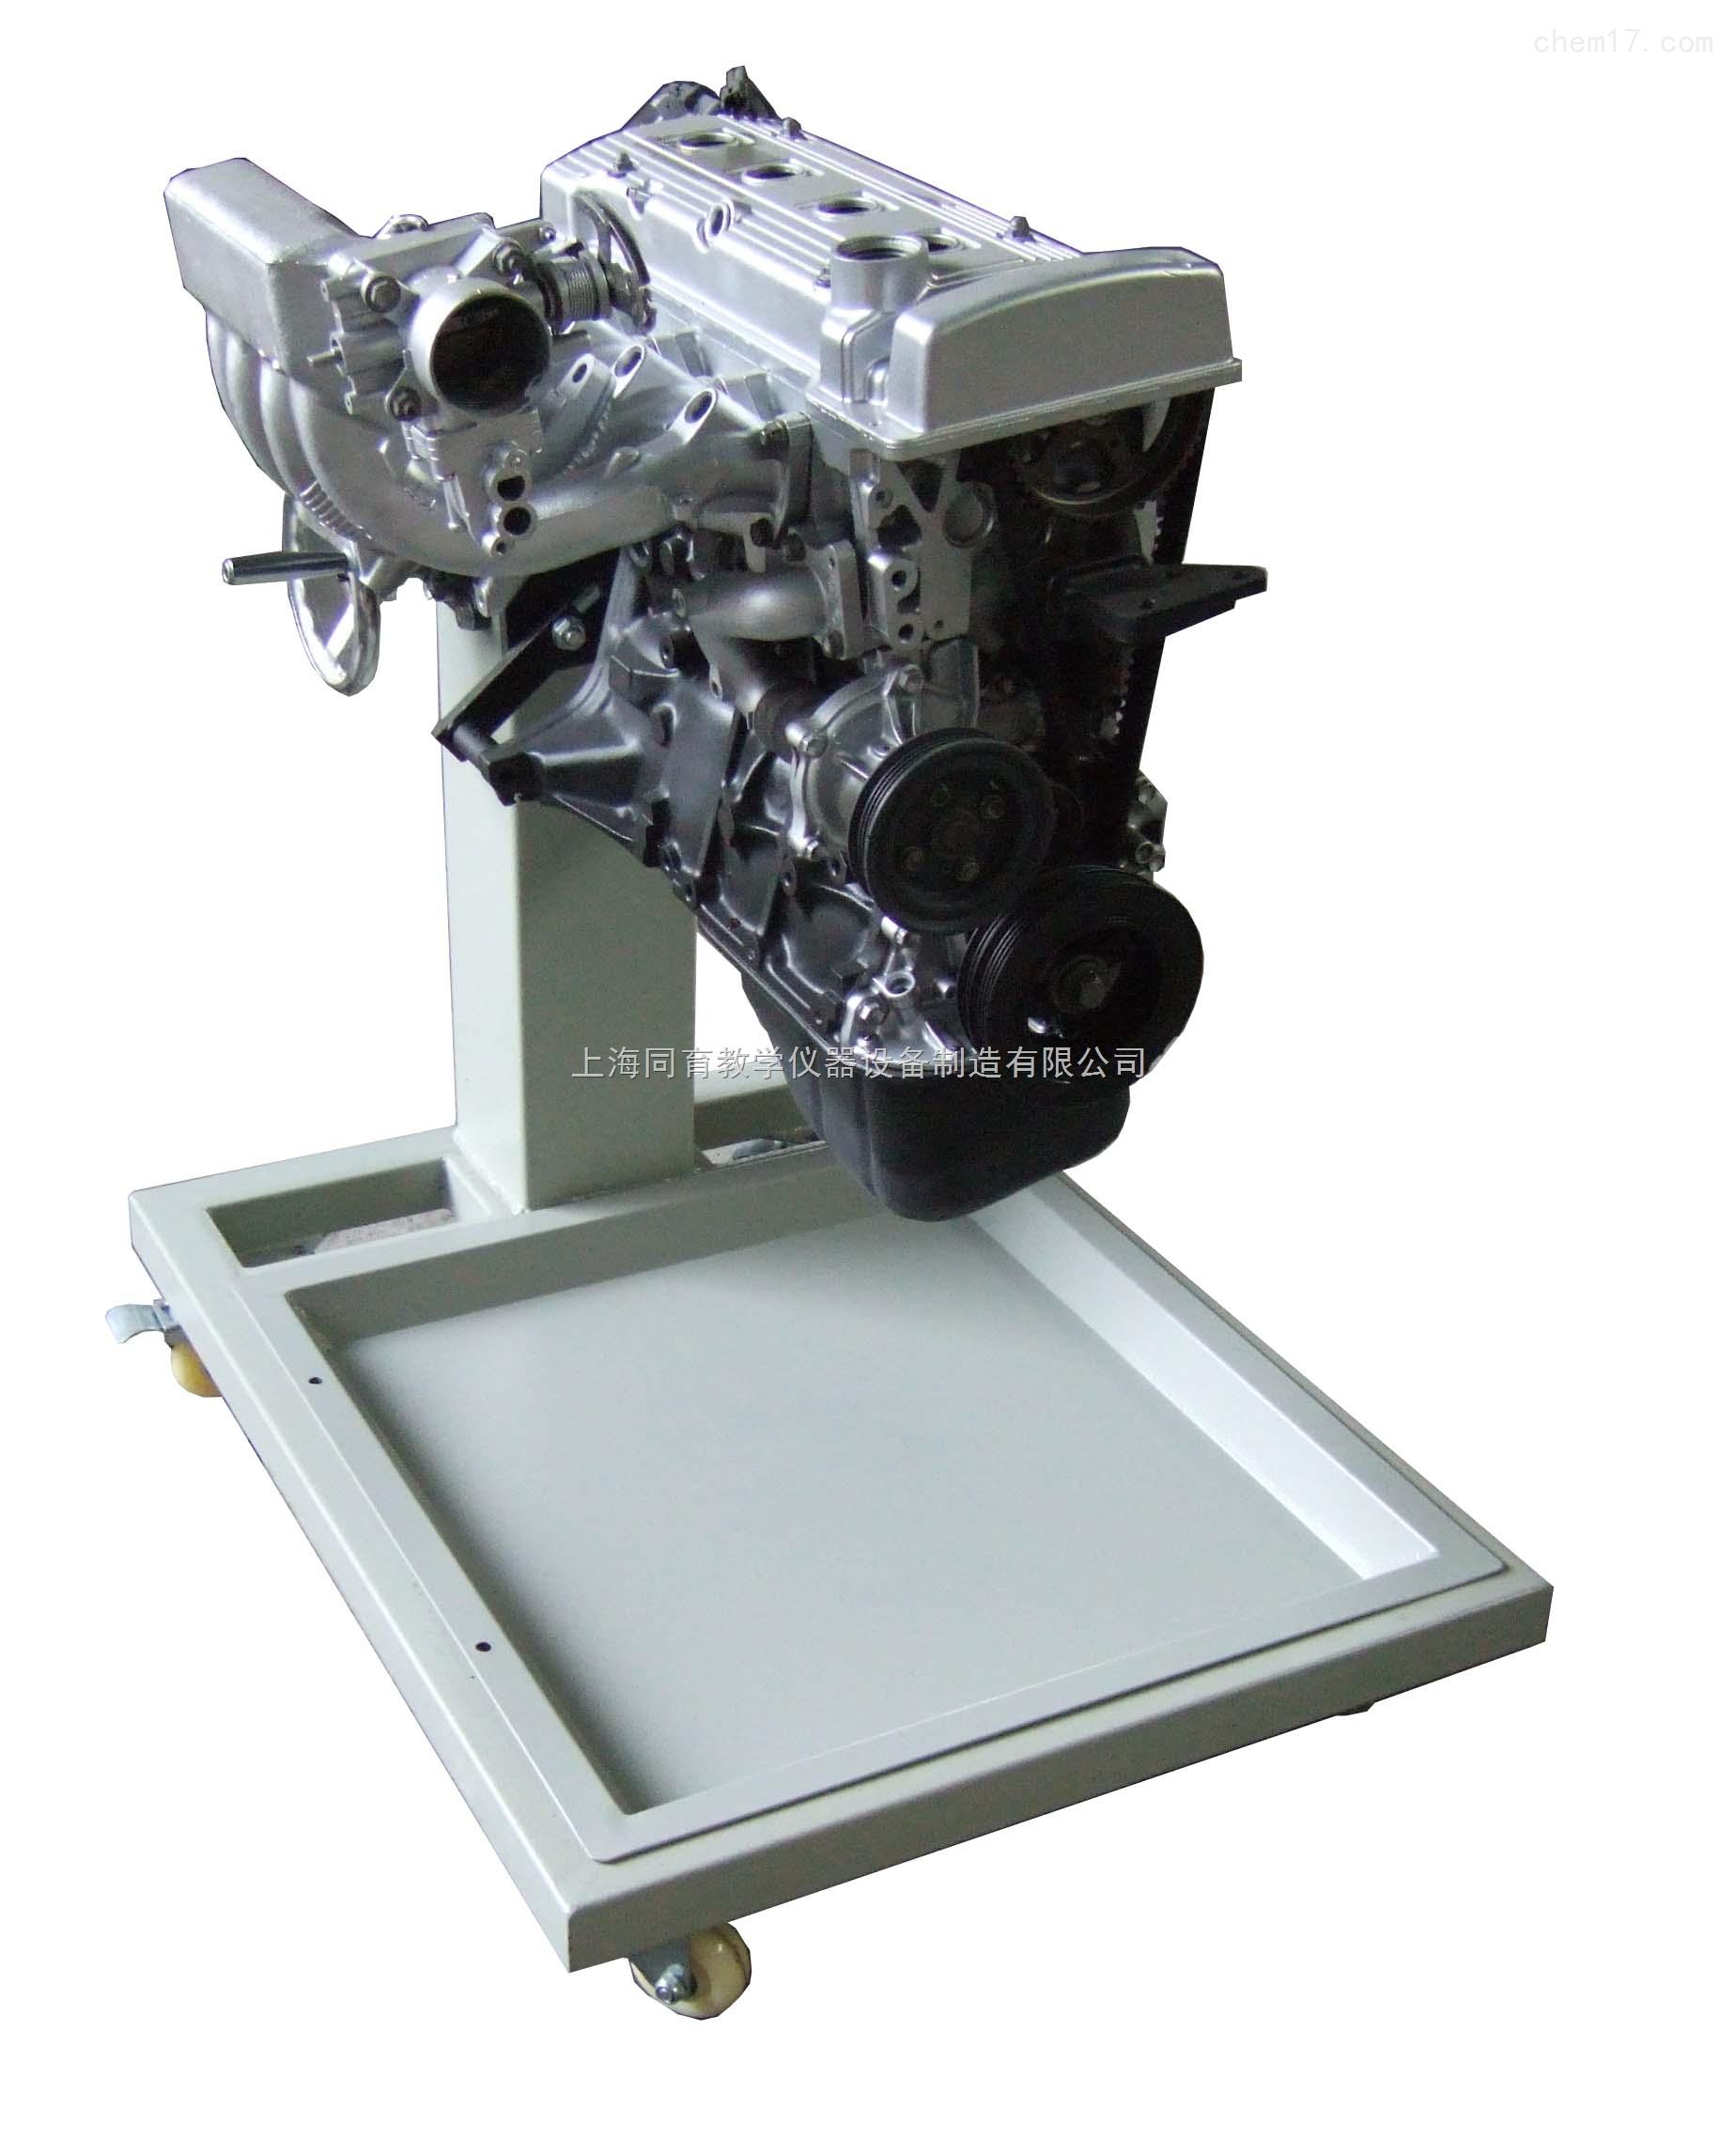 tytep-丰田发动机拆装翻转架|汽车教学设备